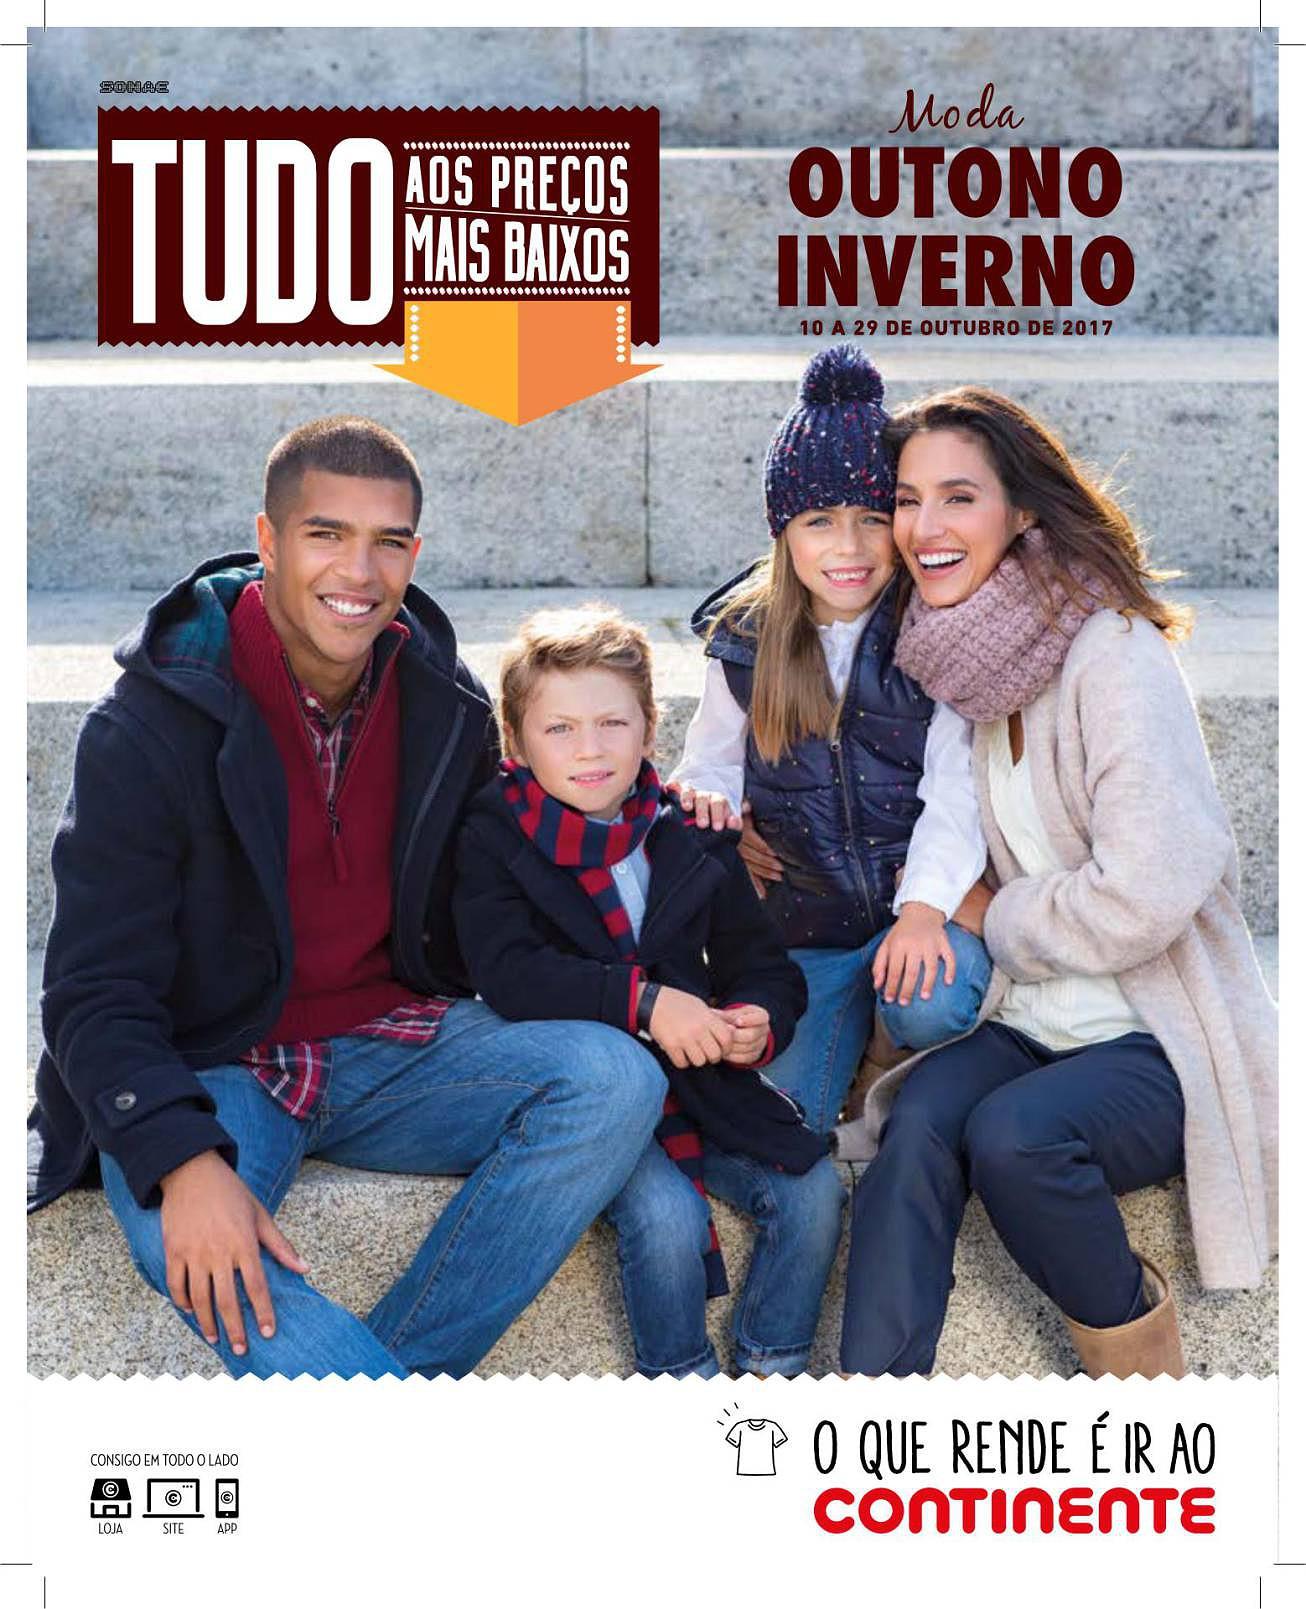 antevisao-promocoes-folheto-continente-outono-10-a-29-outubro-1.jpg